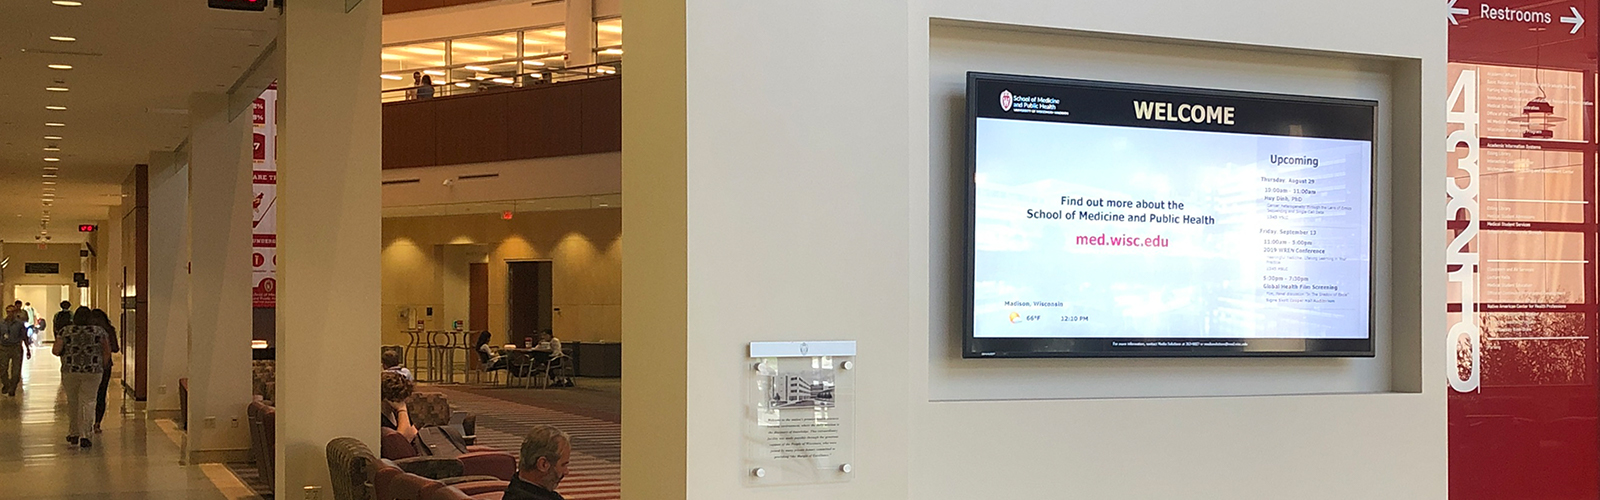 Digital display in hallway of UW-Madison Health Sciences Learning Center